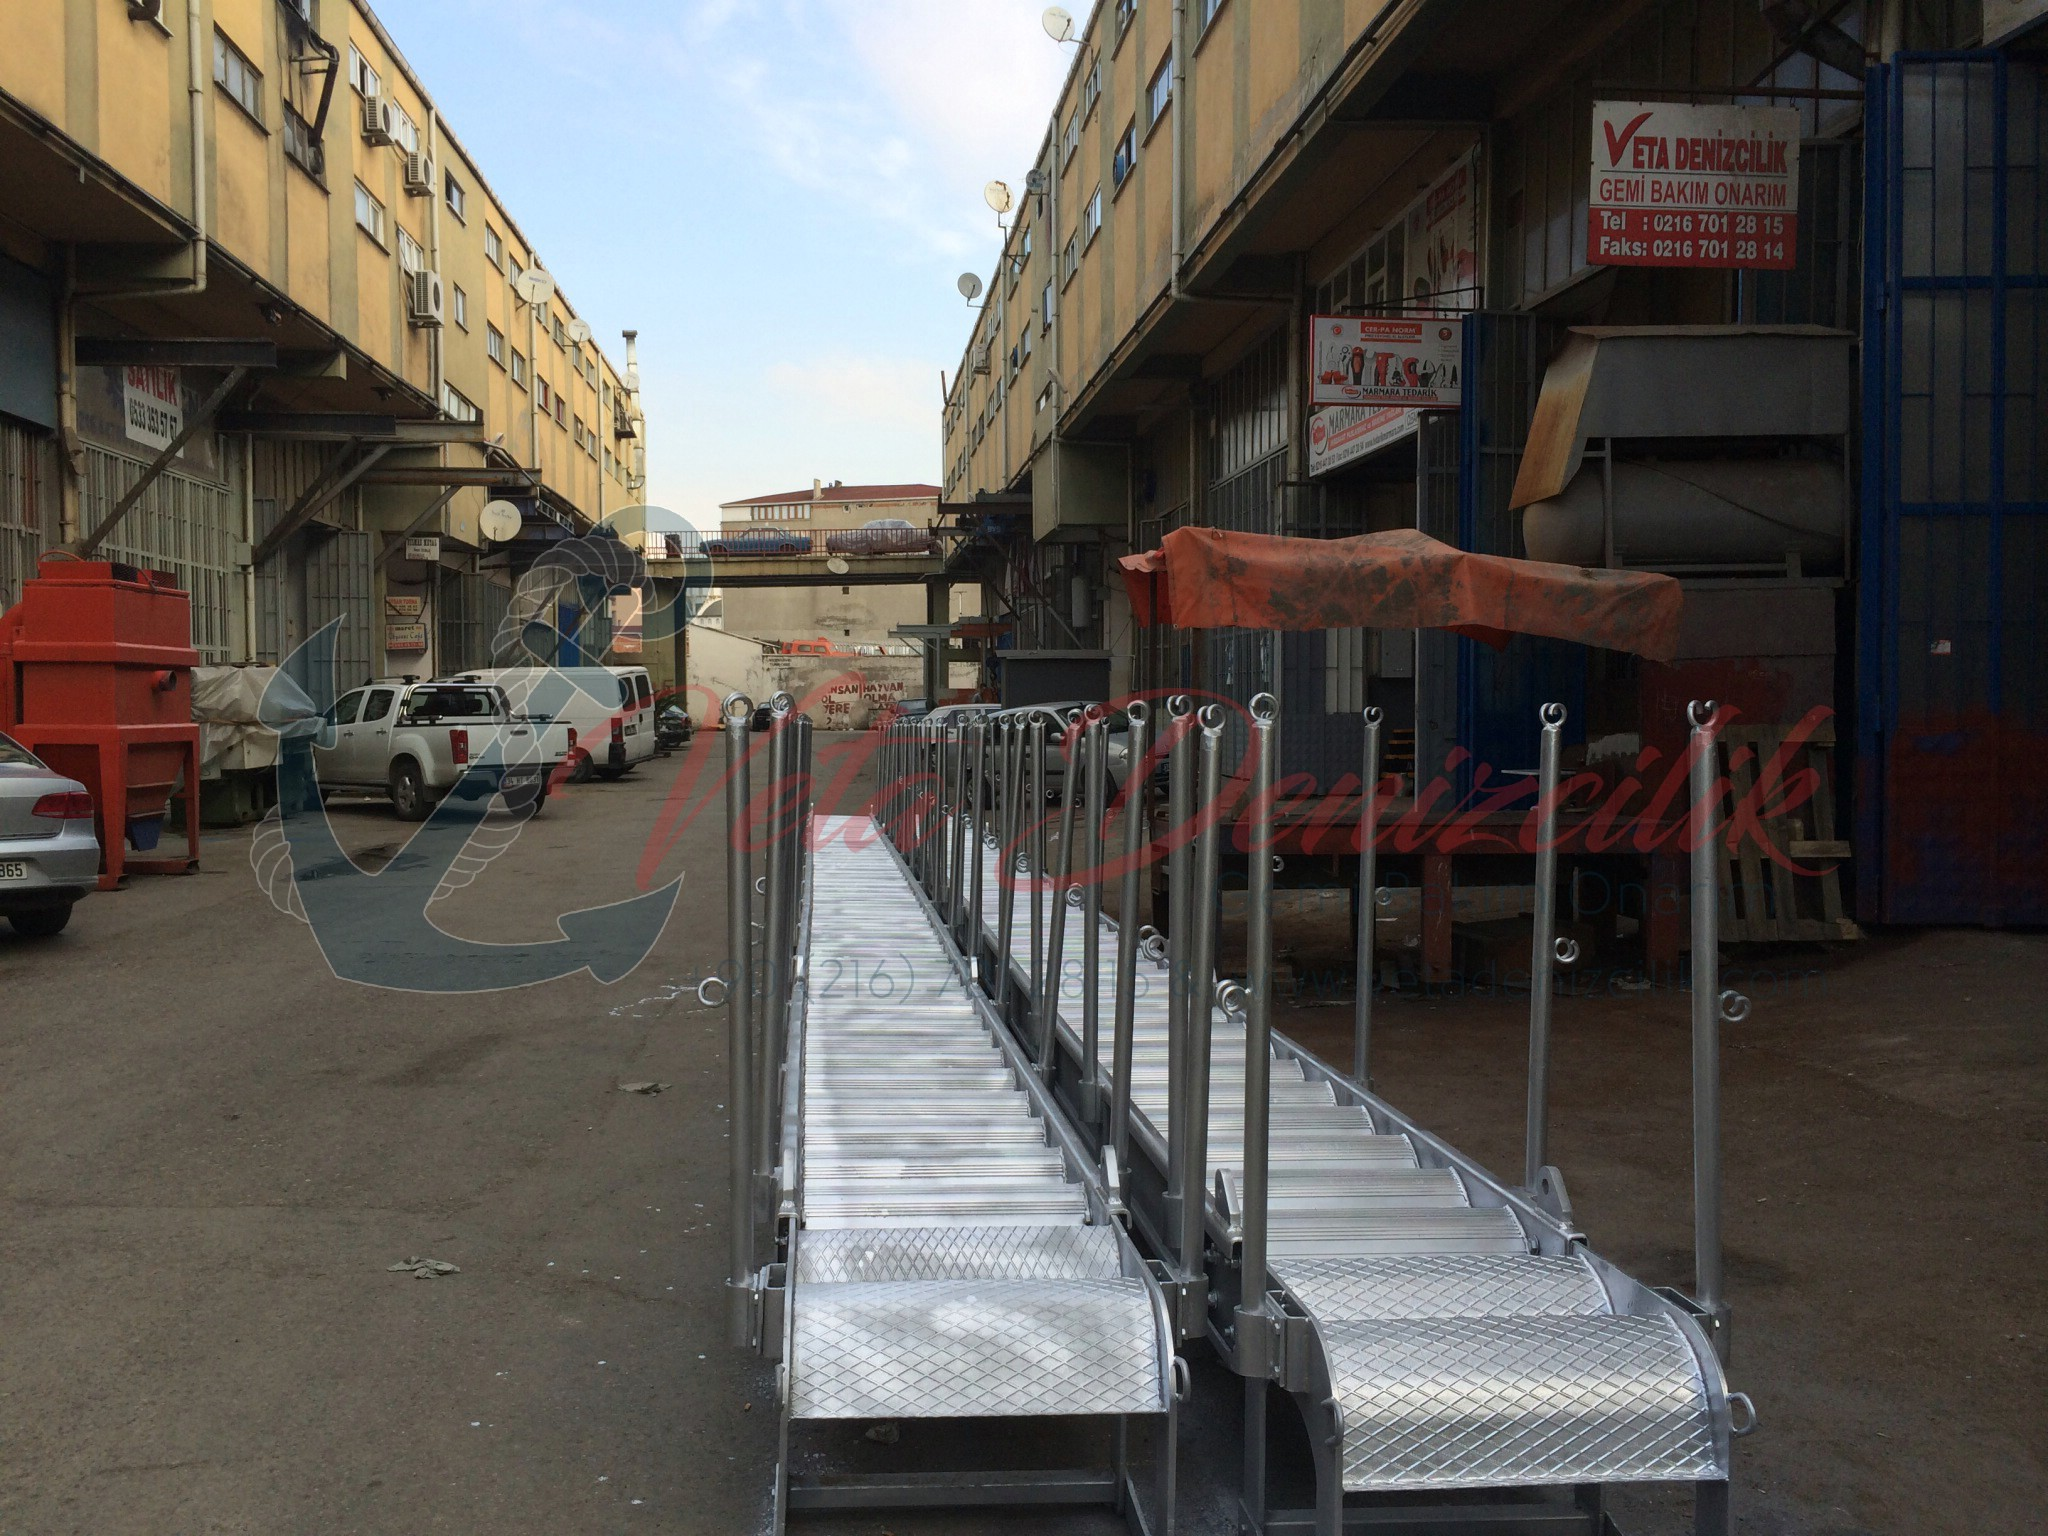 borda-merdiveni-accommodation-ladder-31.jpg